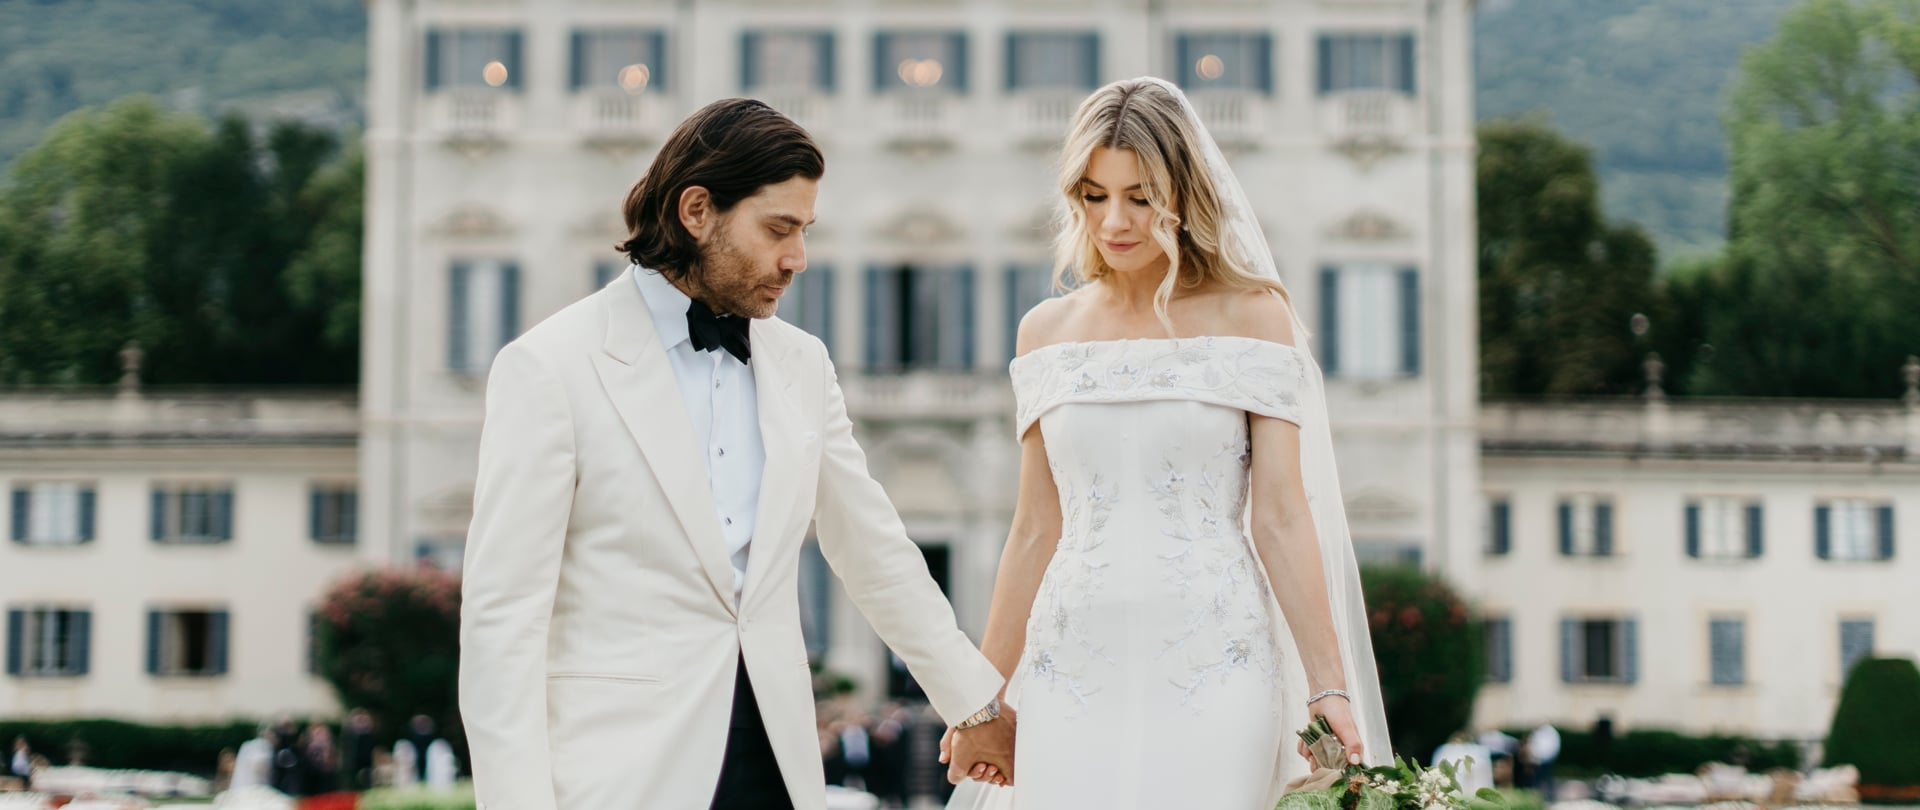 Jessica & Maurice Wedding Video Filmed at Lake Como, Italy